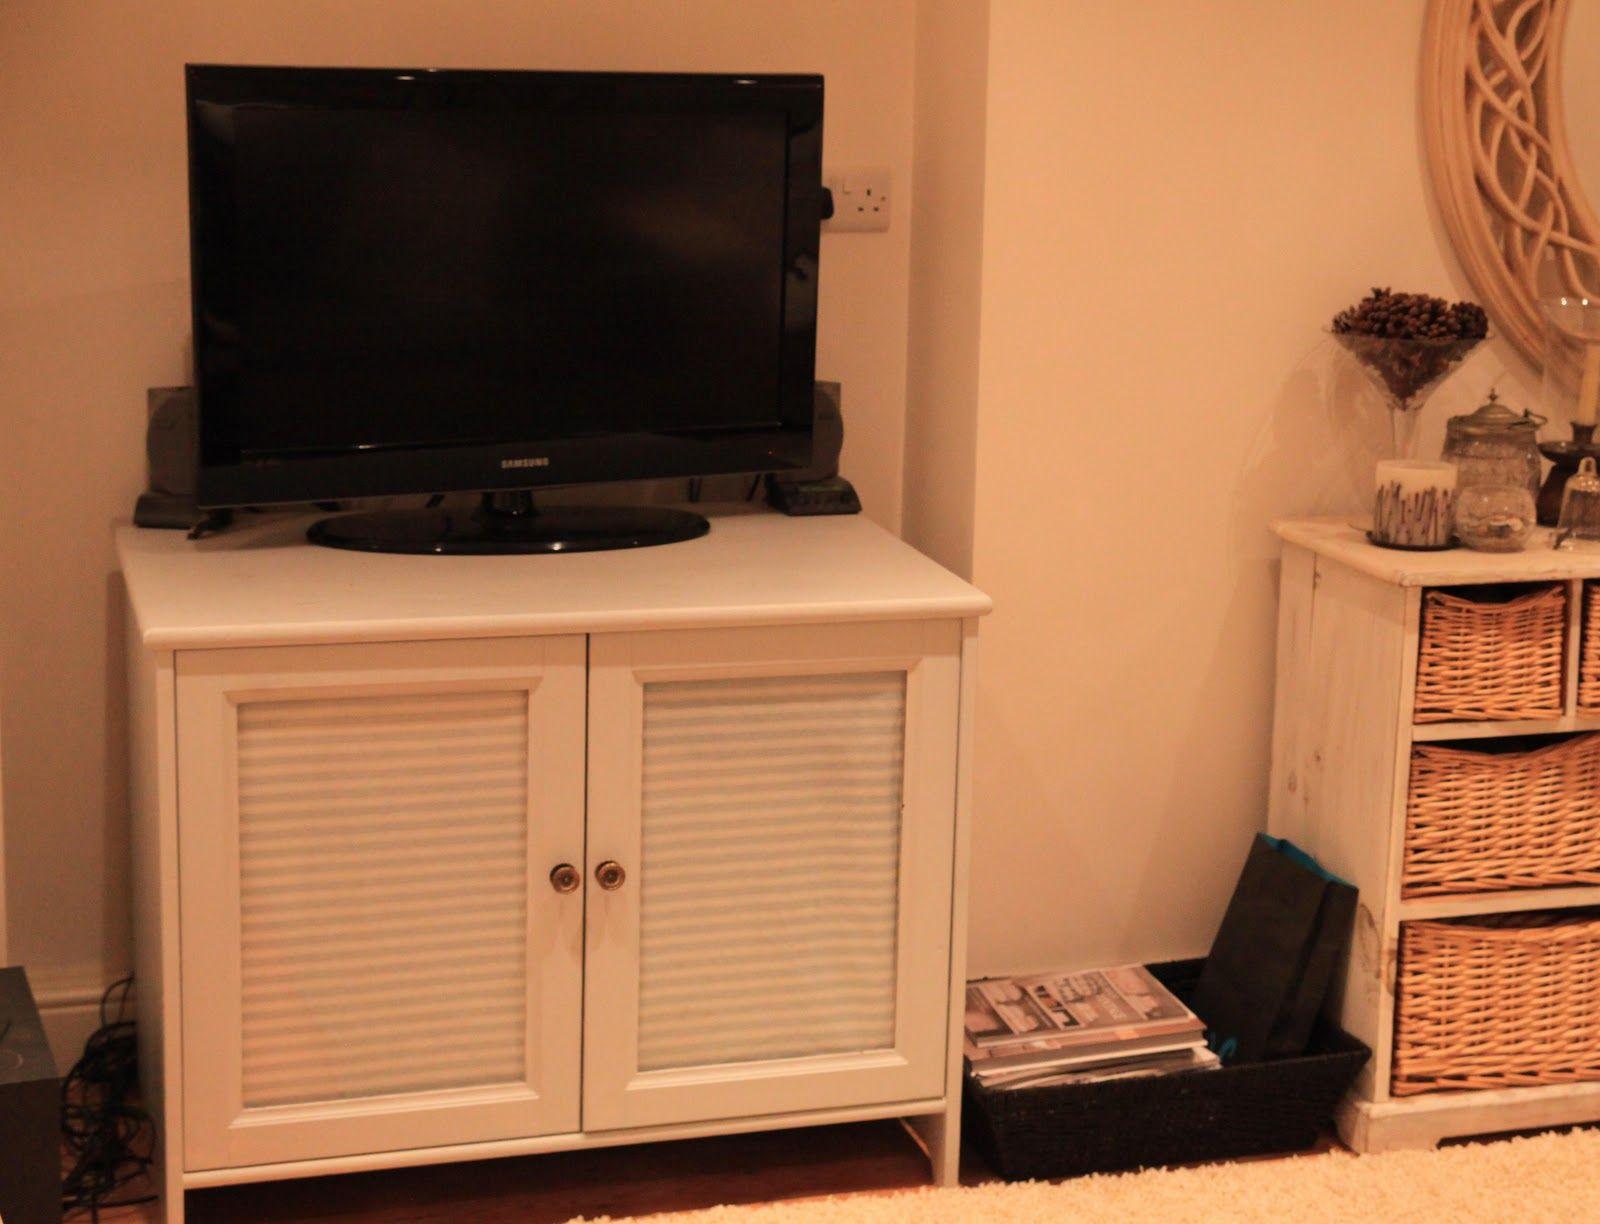 Ikea Küchenbuffet ~ Bumblebee cottage: ikea hack leksvik tv stand painted diy